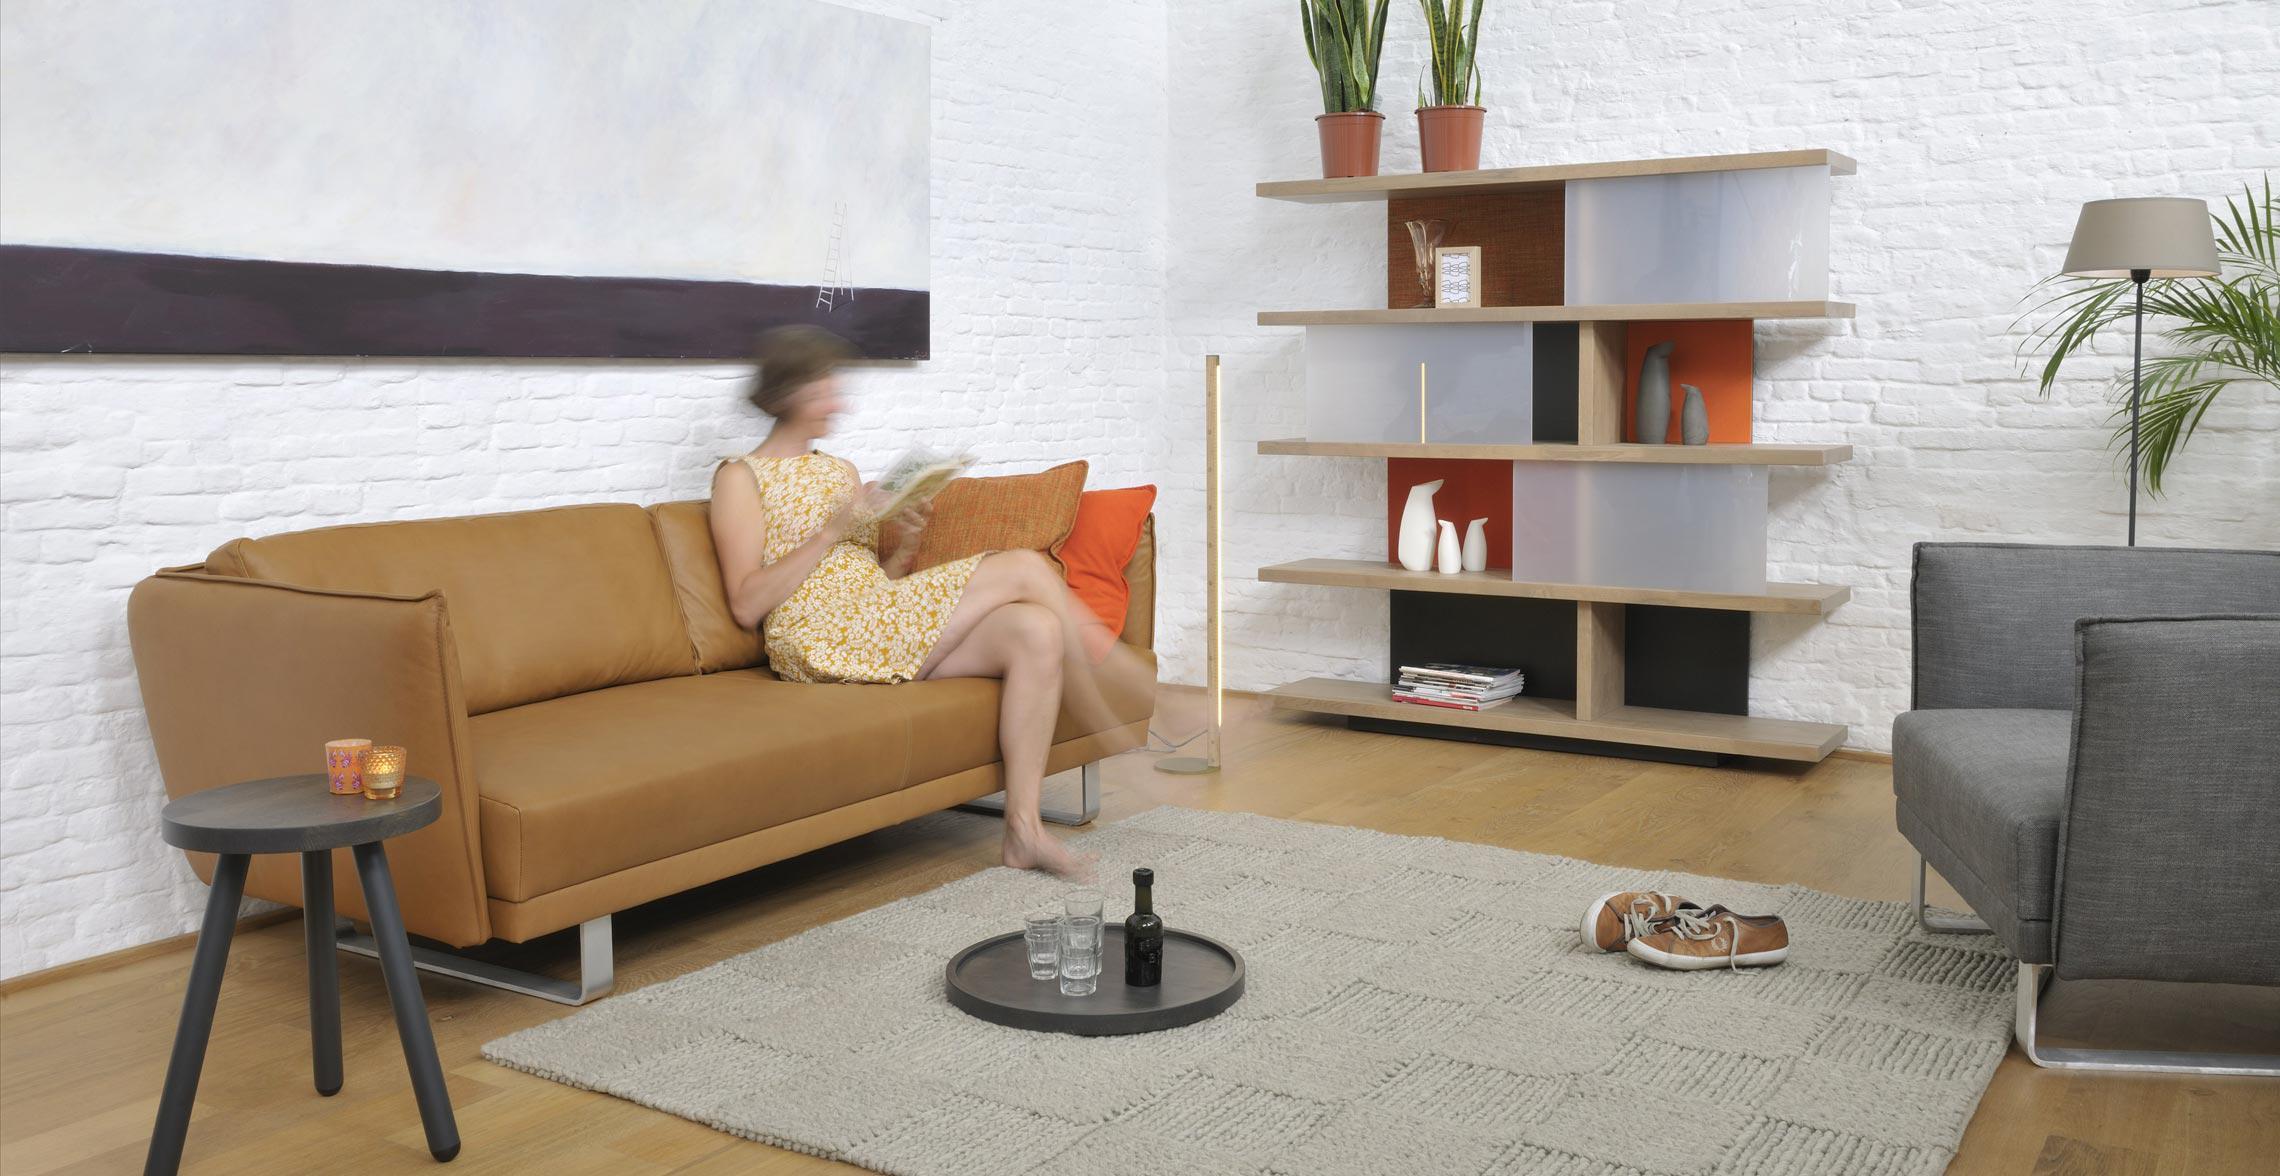 Aanbieding Design Meubels.Design Meubelen Interieur Plus Peer Design Eetkamers Salons